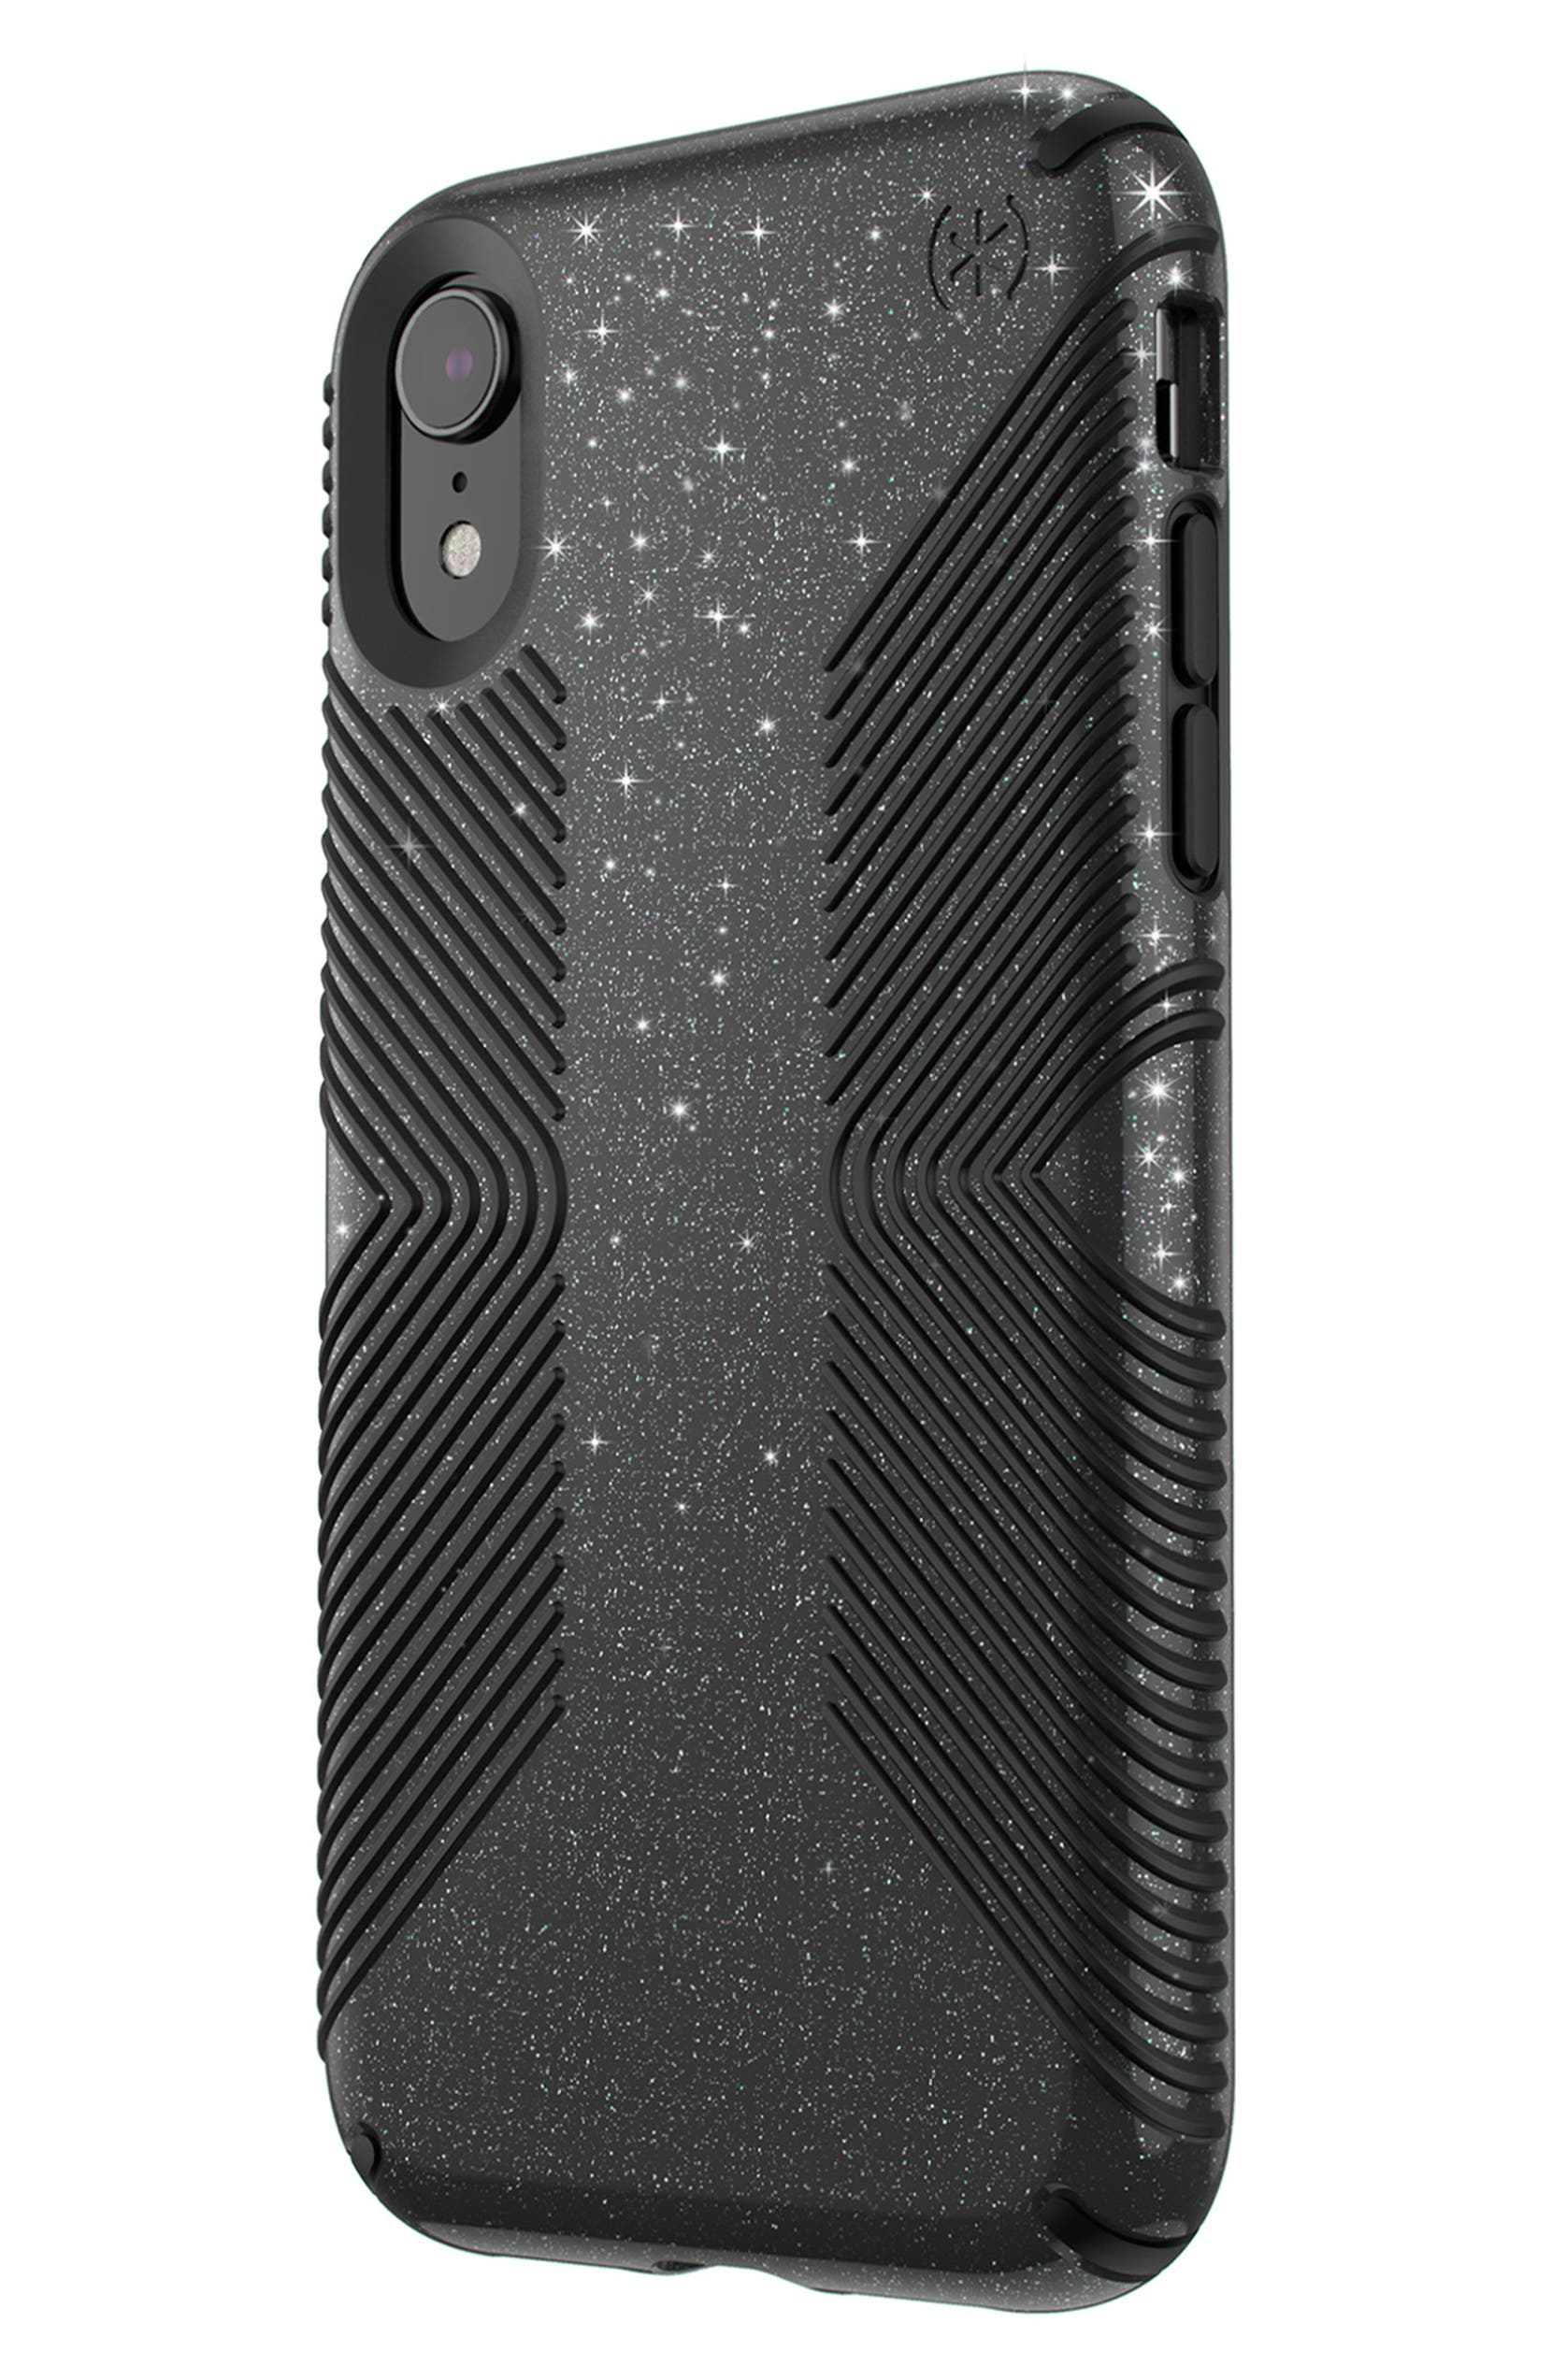 quality design 16d9e a7cfb Presidio Grip iPhone X & XS Case